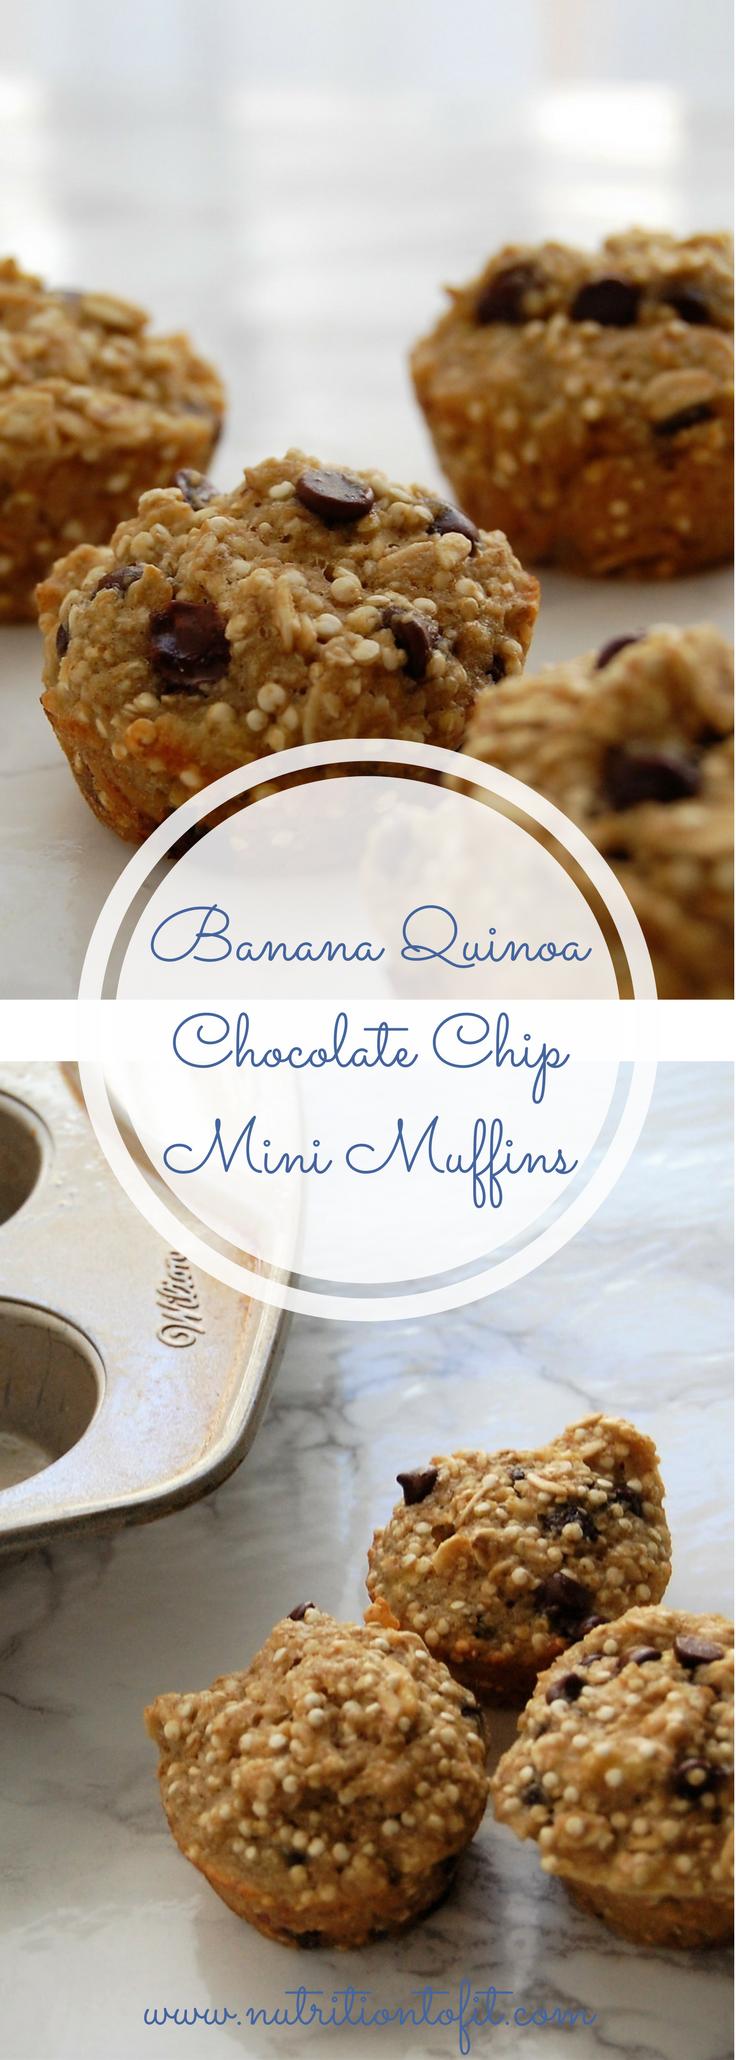 Banana Chocolate Oat Flour Muffins